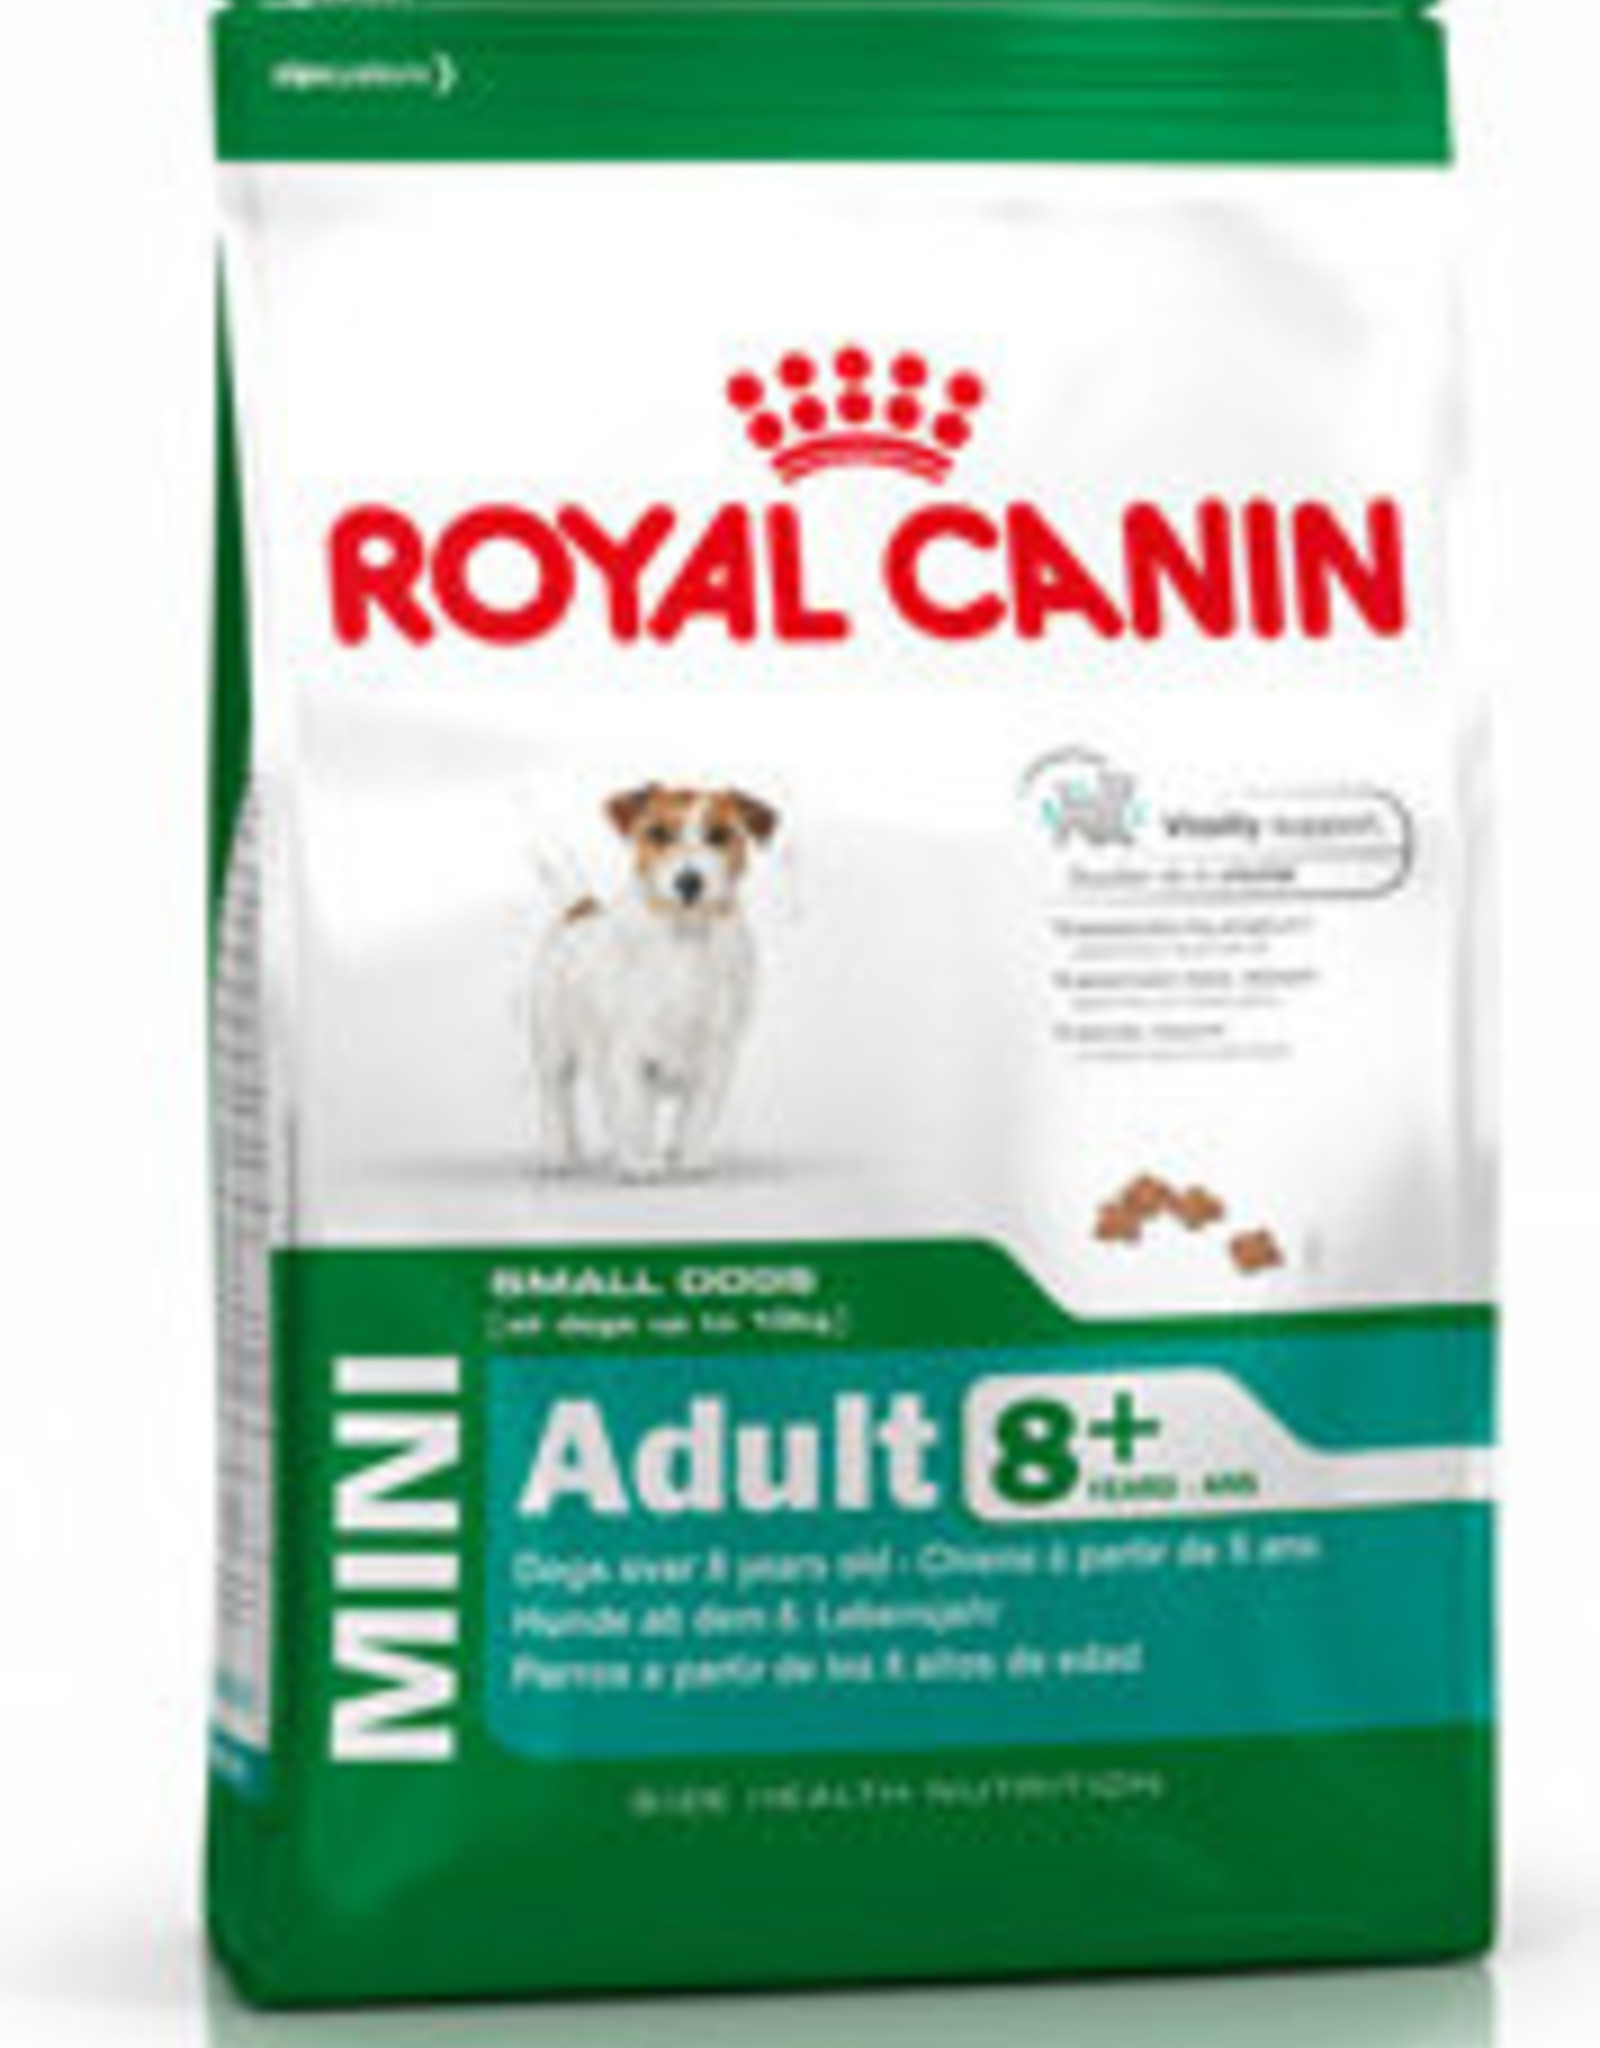 Royal Canin Royal Canin Shn Mini Adult Hond +8 4kg